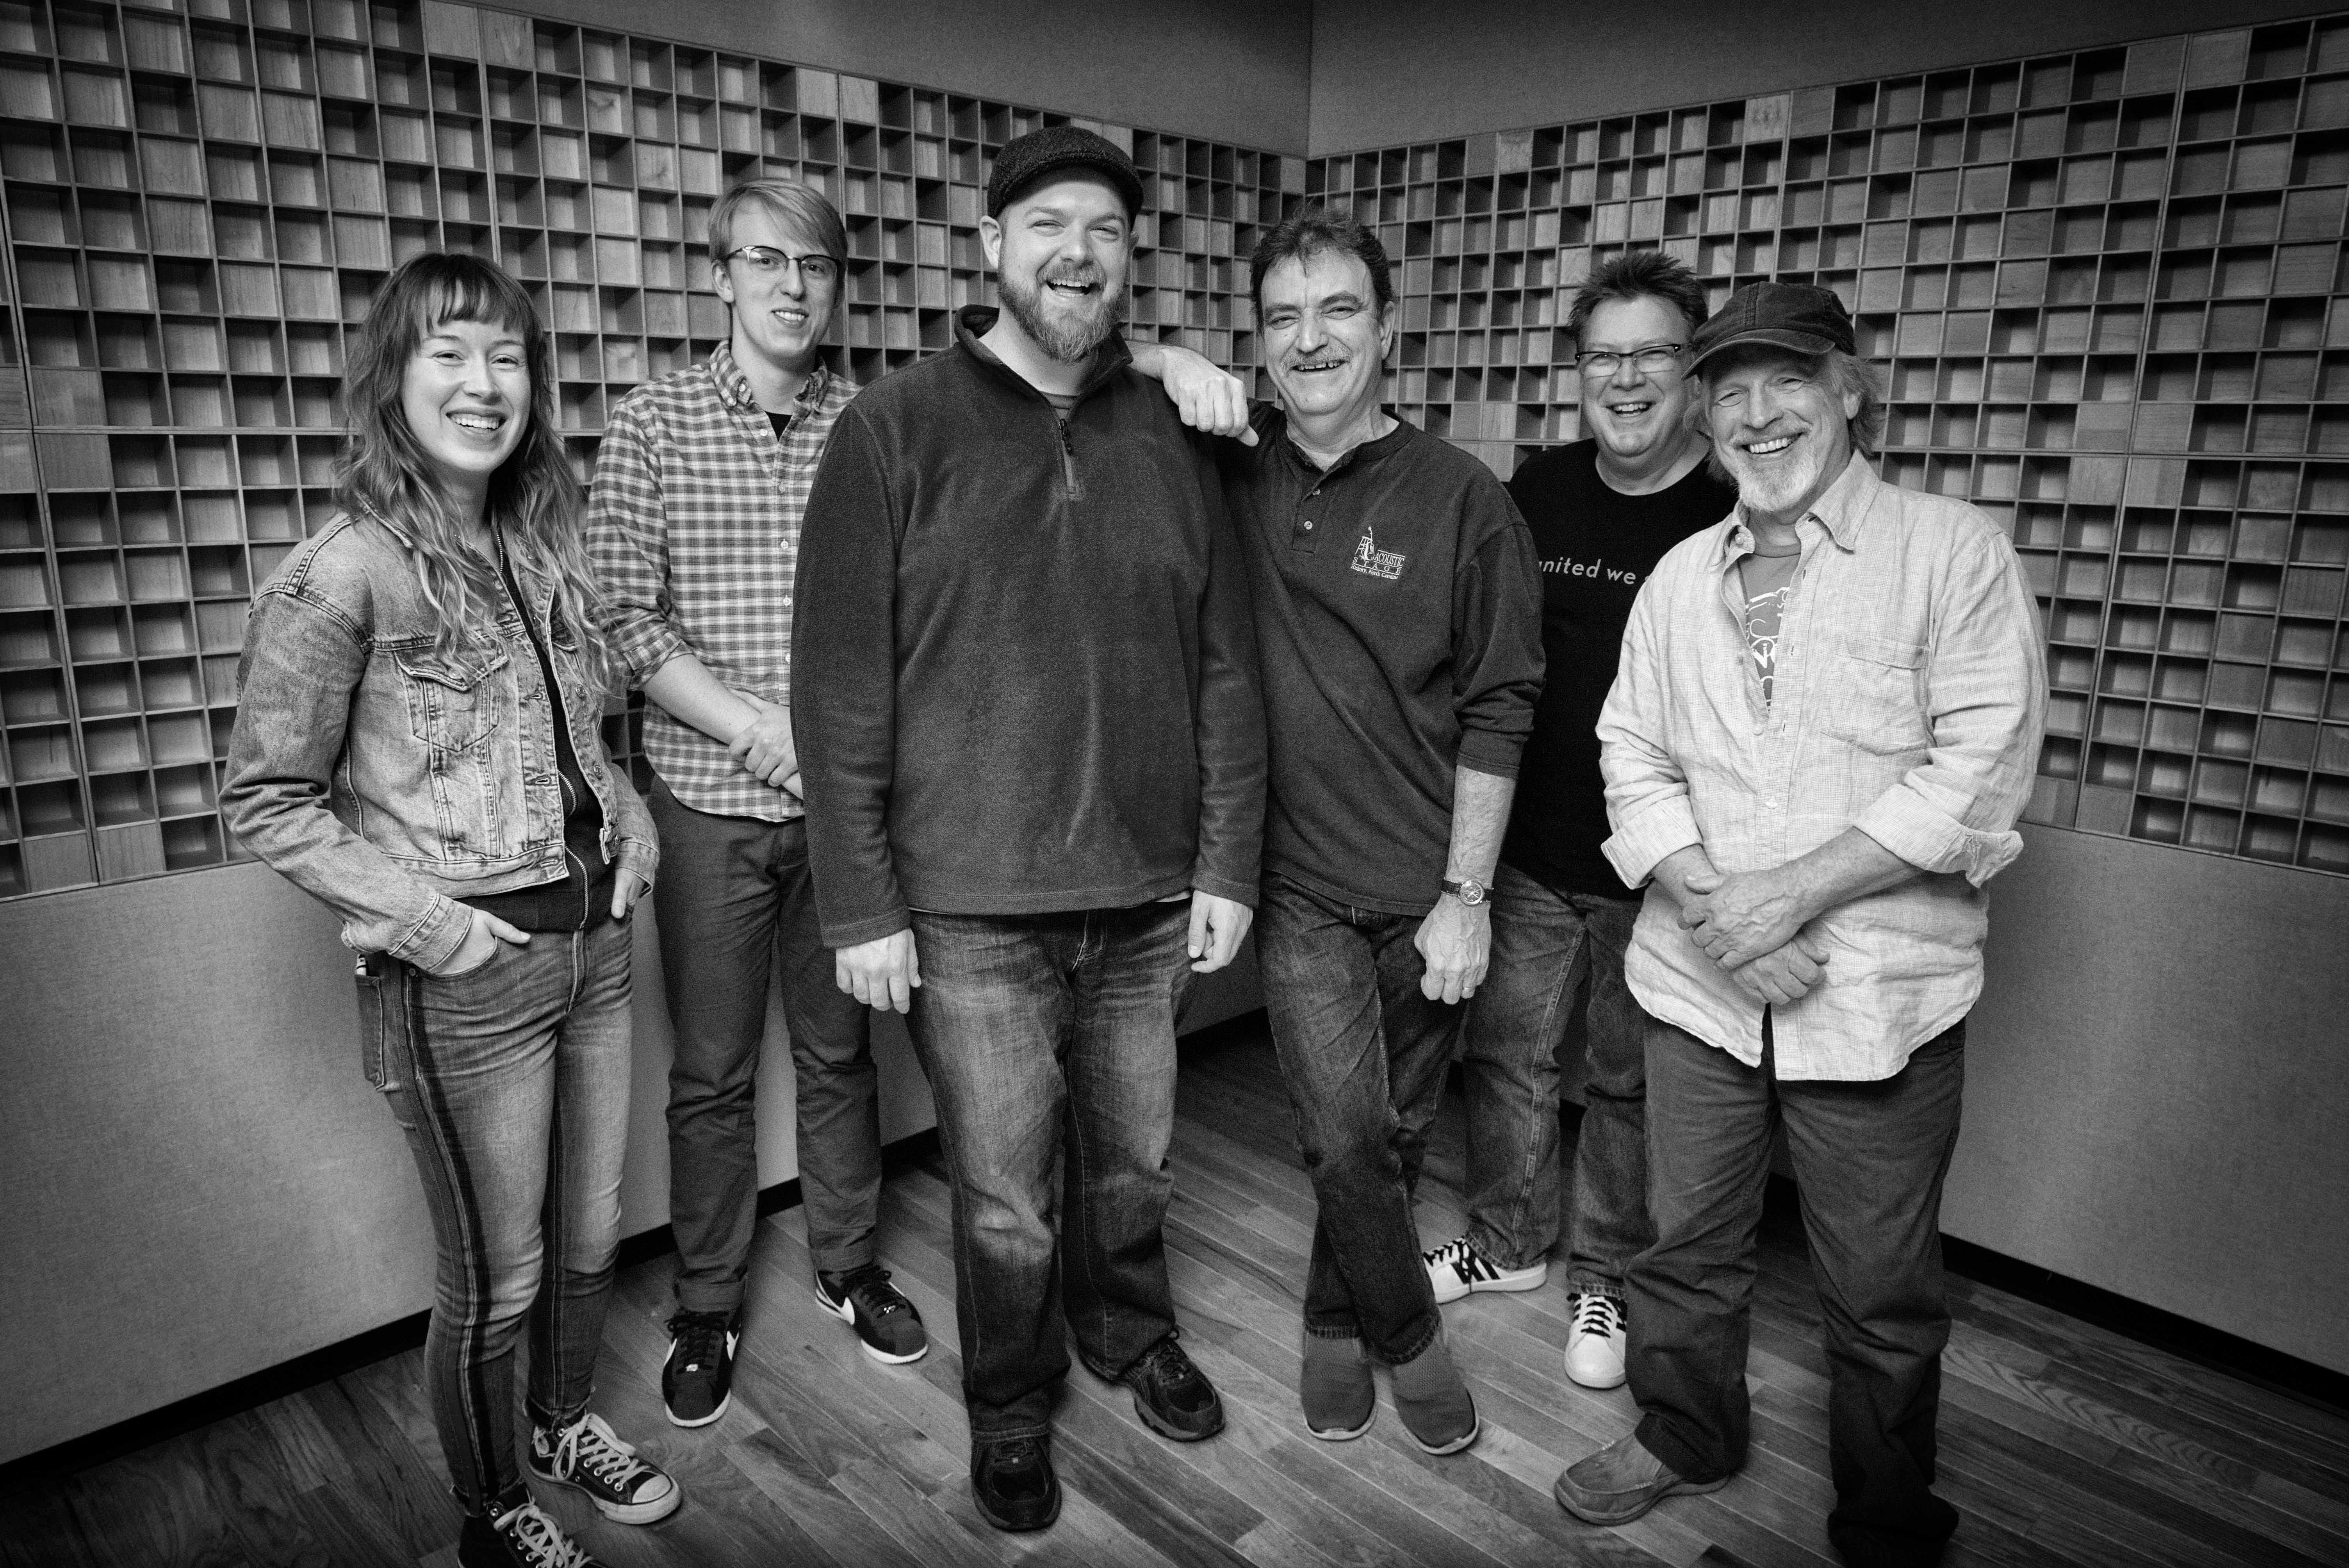 Brownwyn, Thomas, Nate, Wyatt, Ned, Todd (b_w hi res) Photo credit Dan Boner